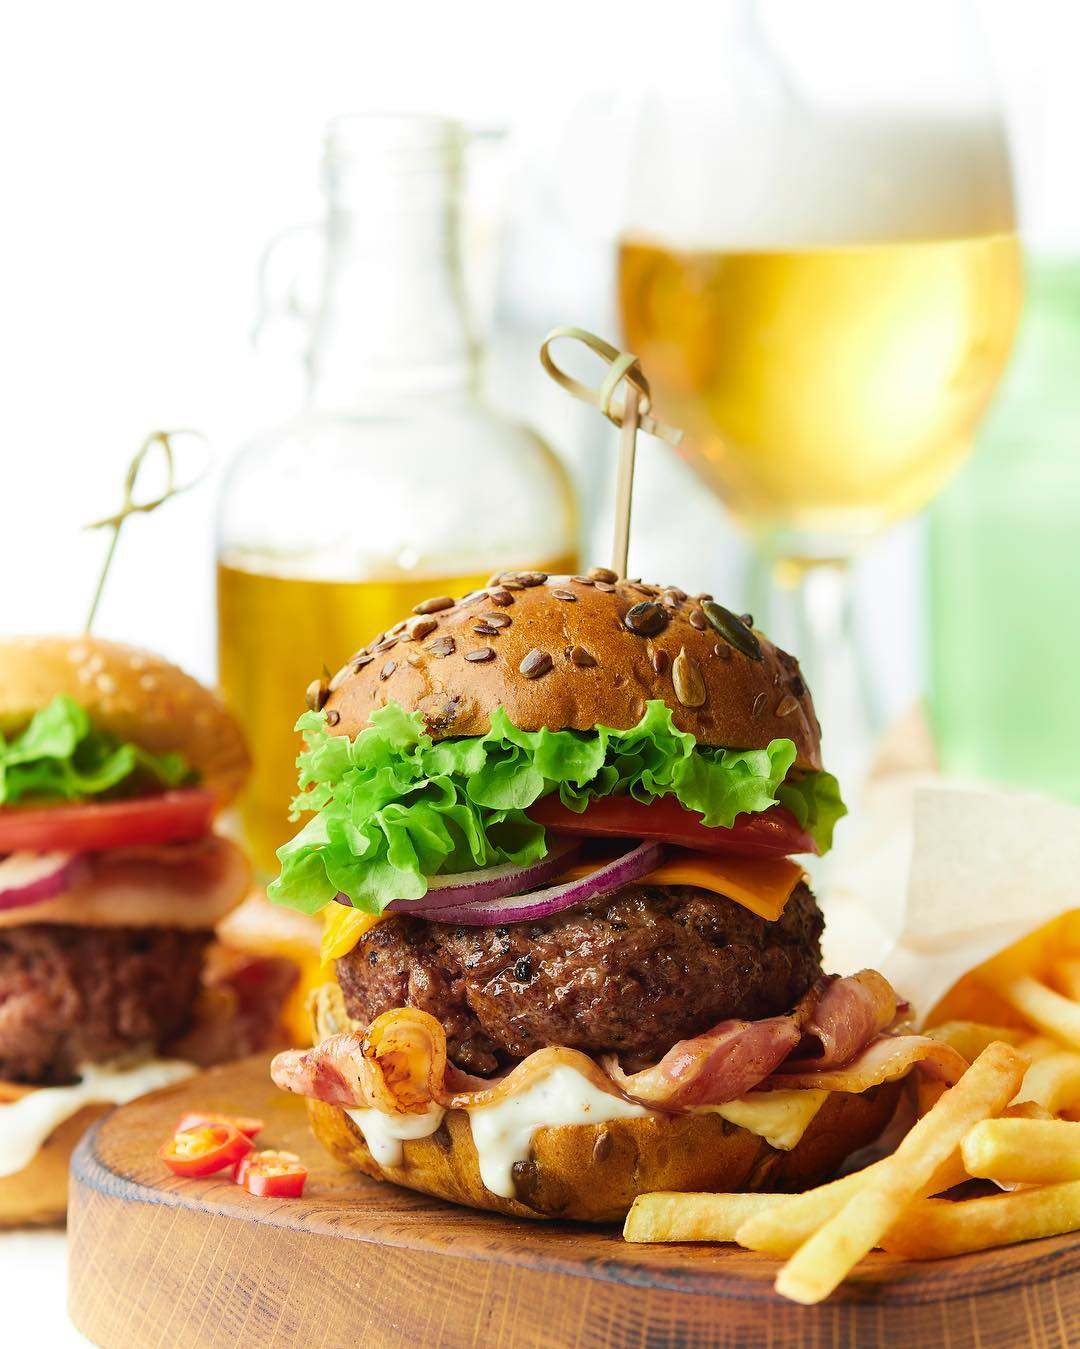 Бургер, картофель фри и напиток